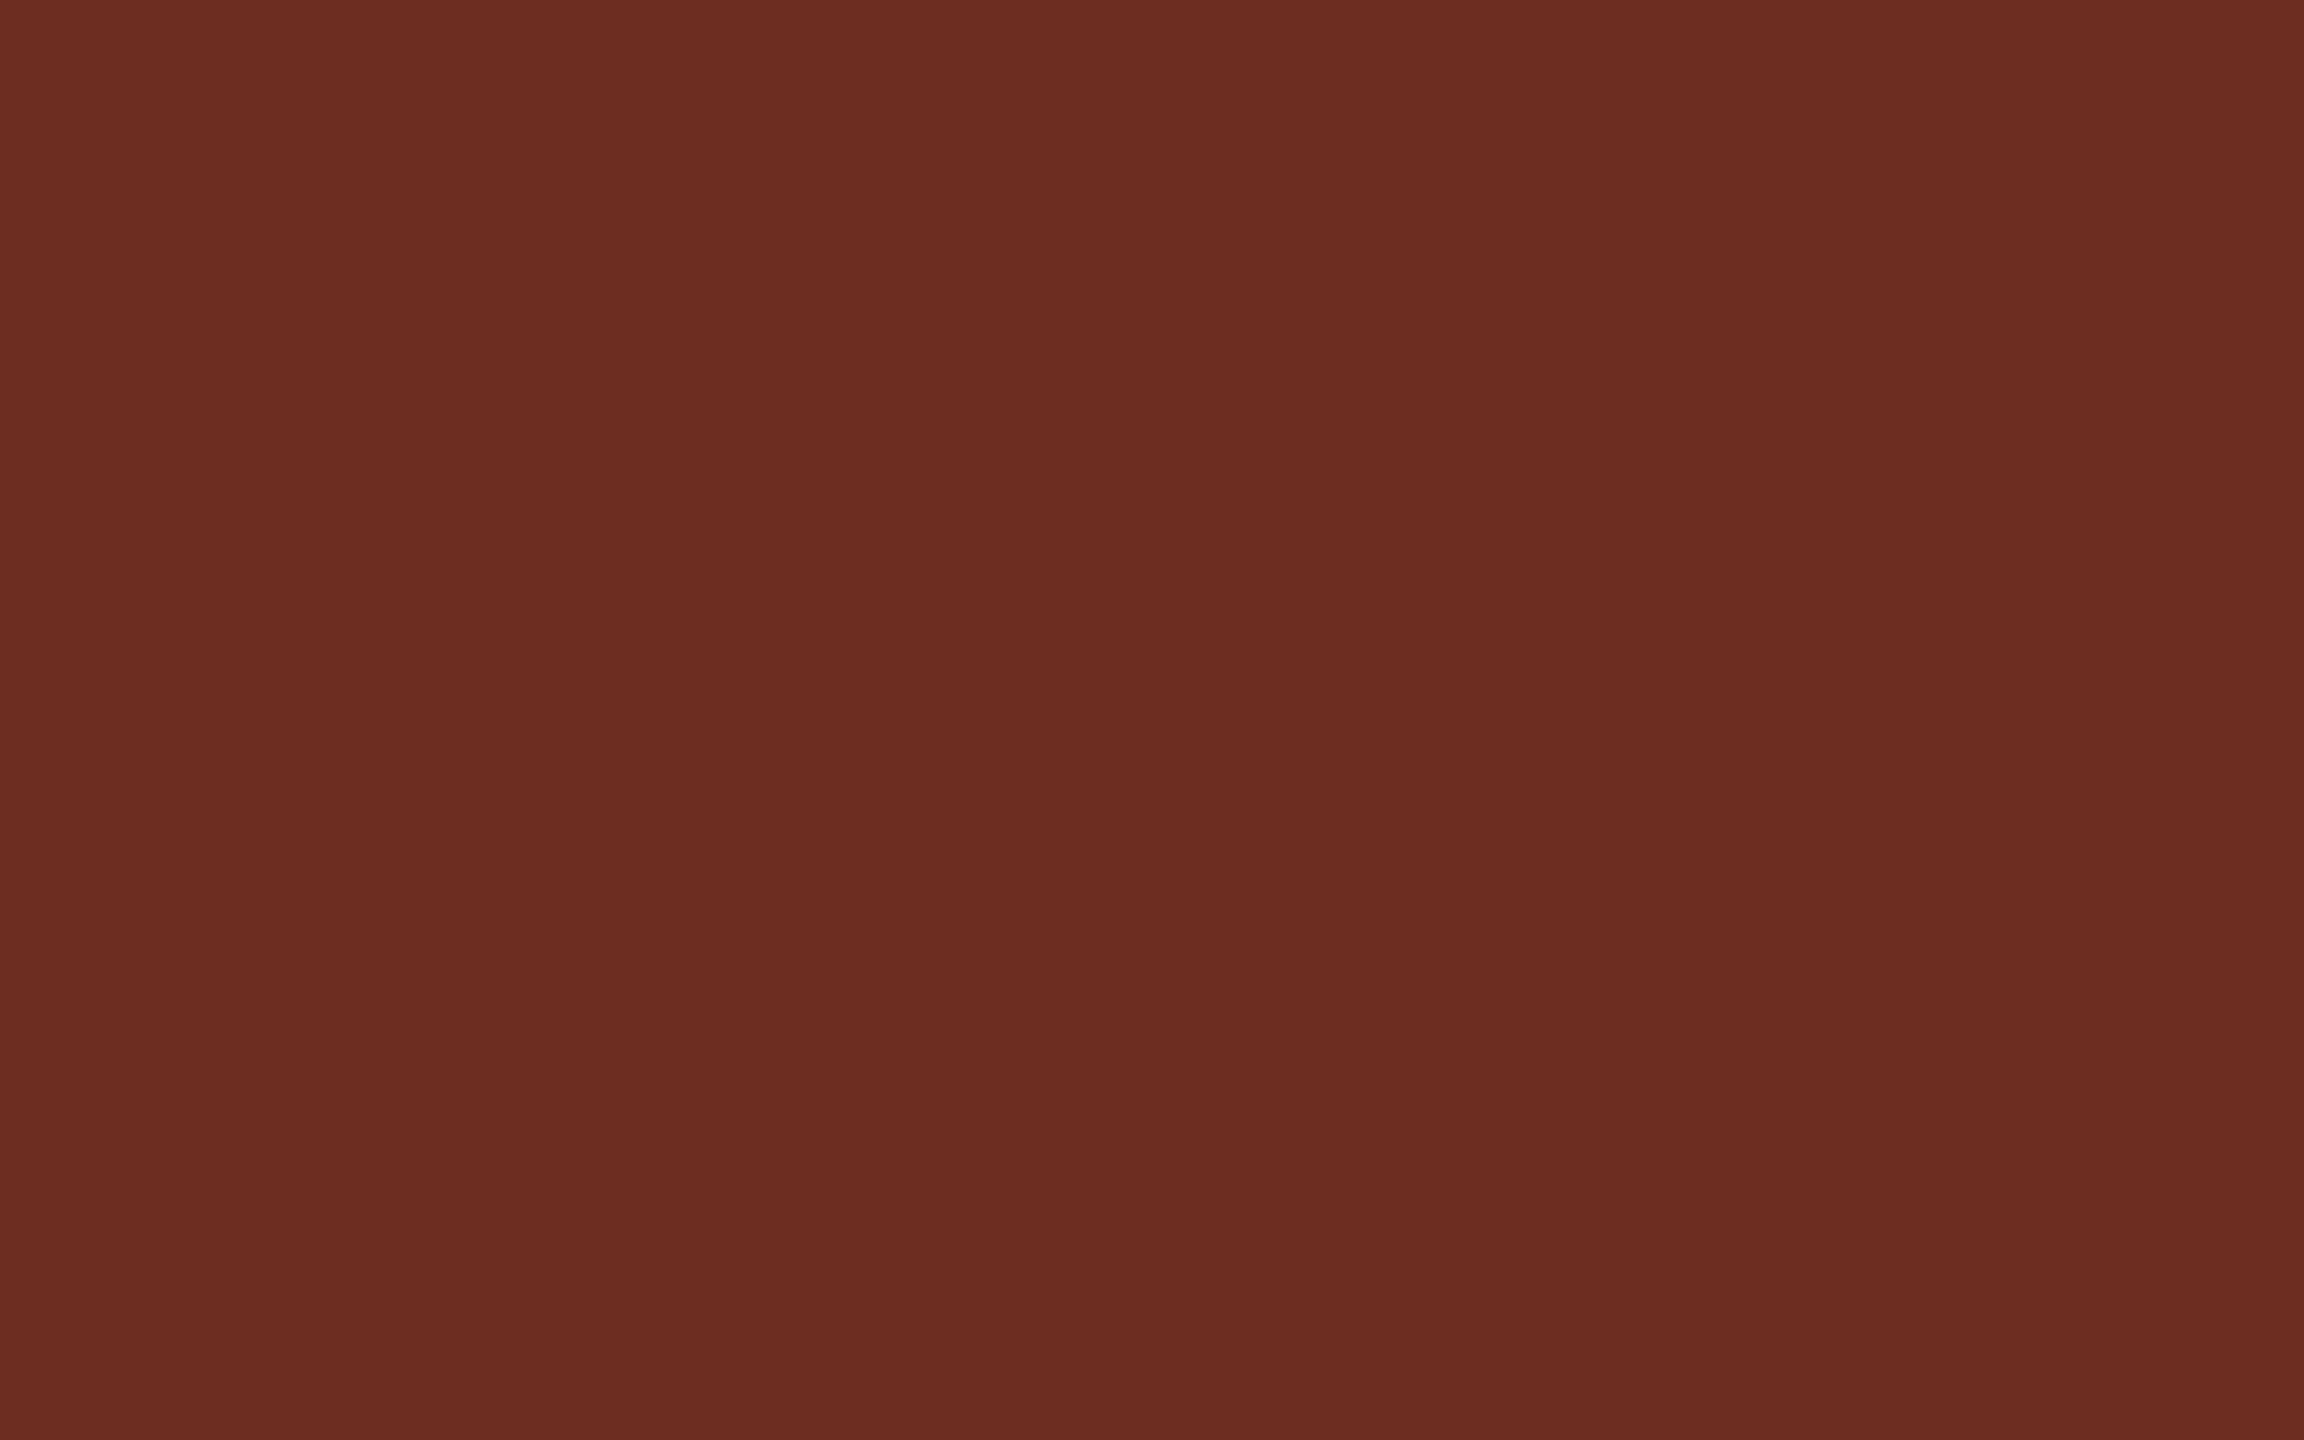 2304x1440 Liver Organ Solid Color Background